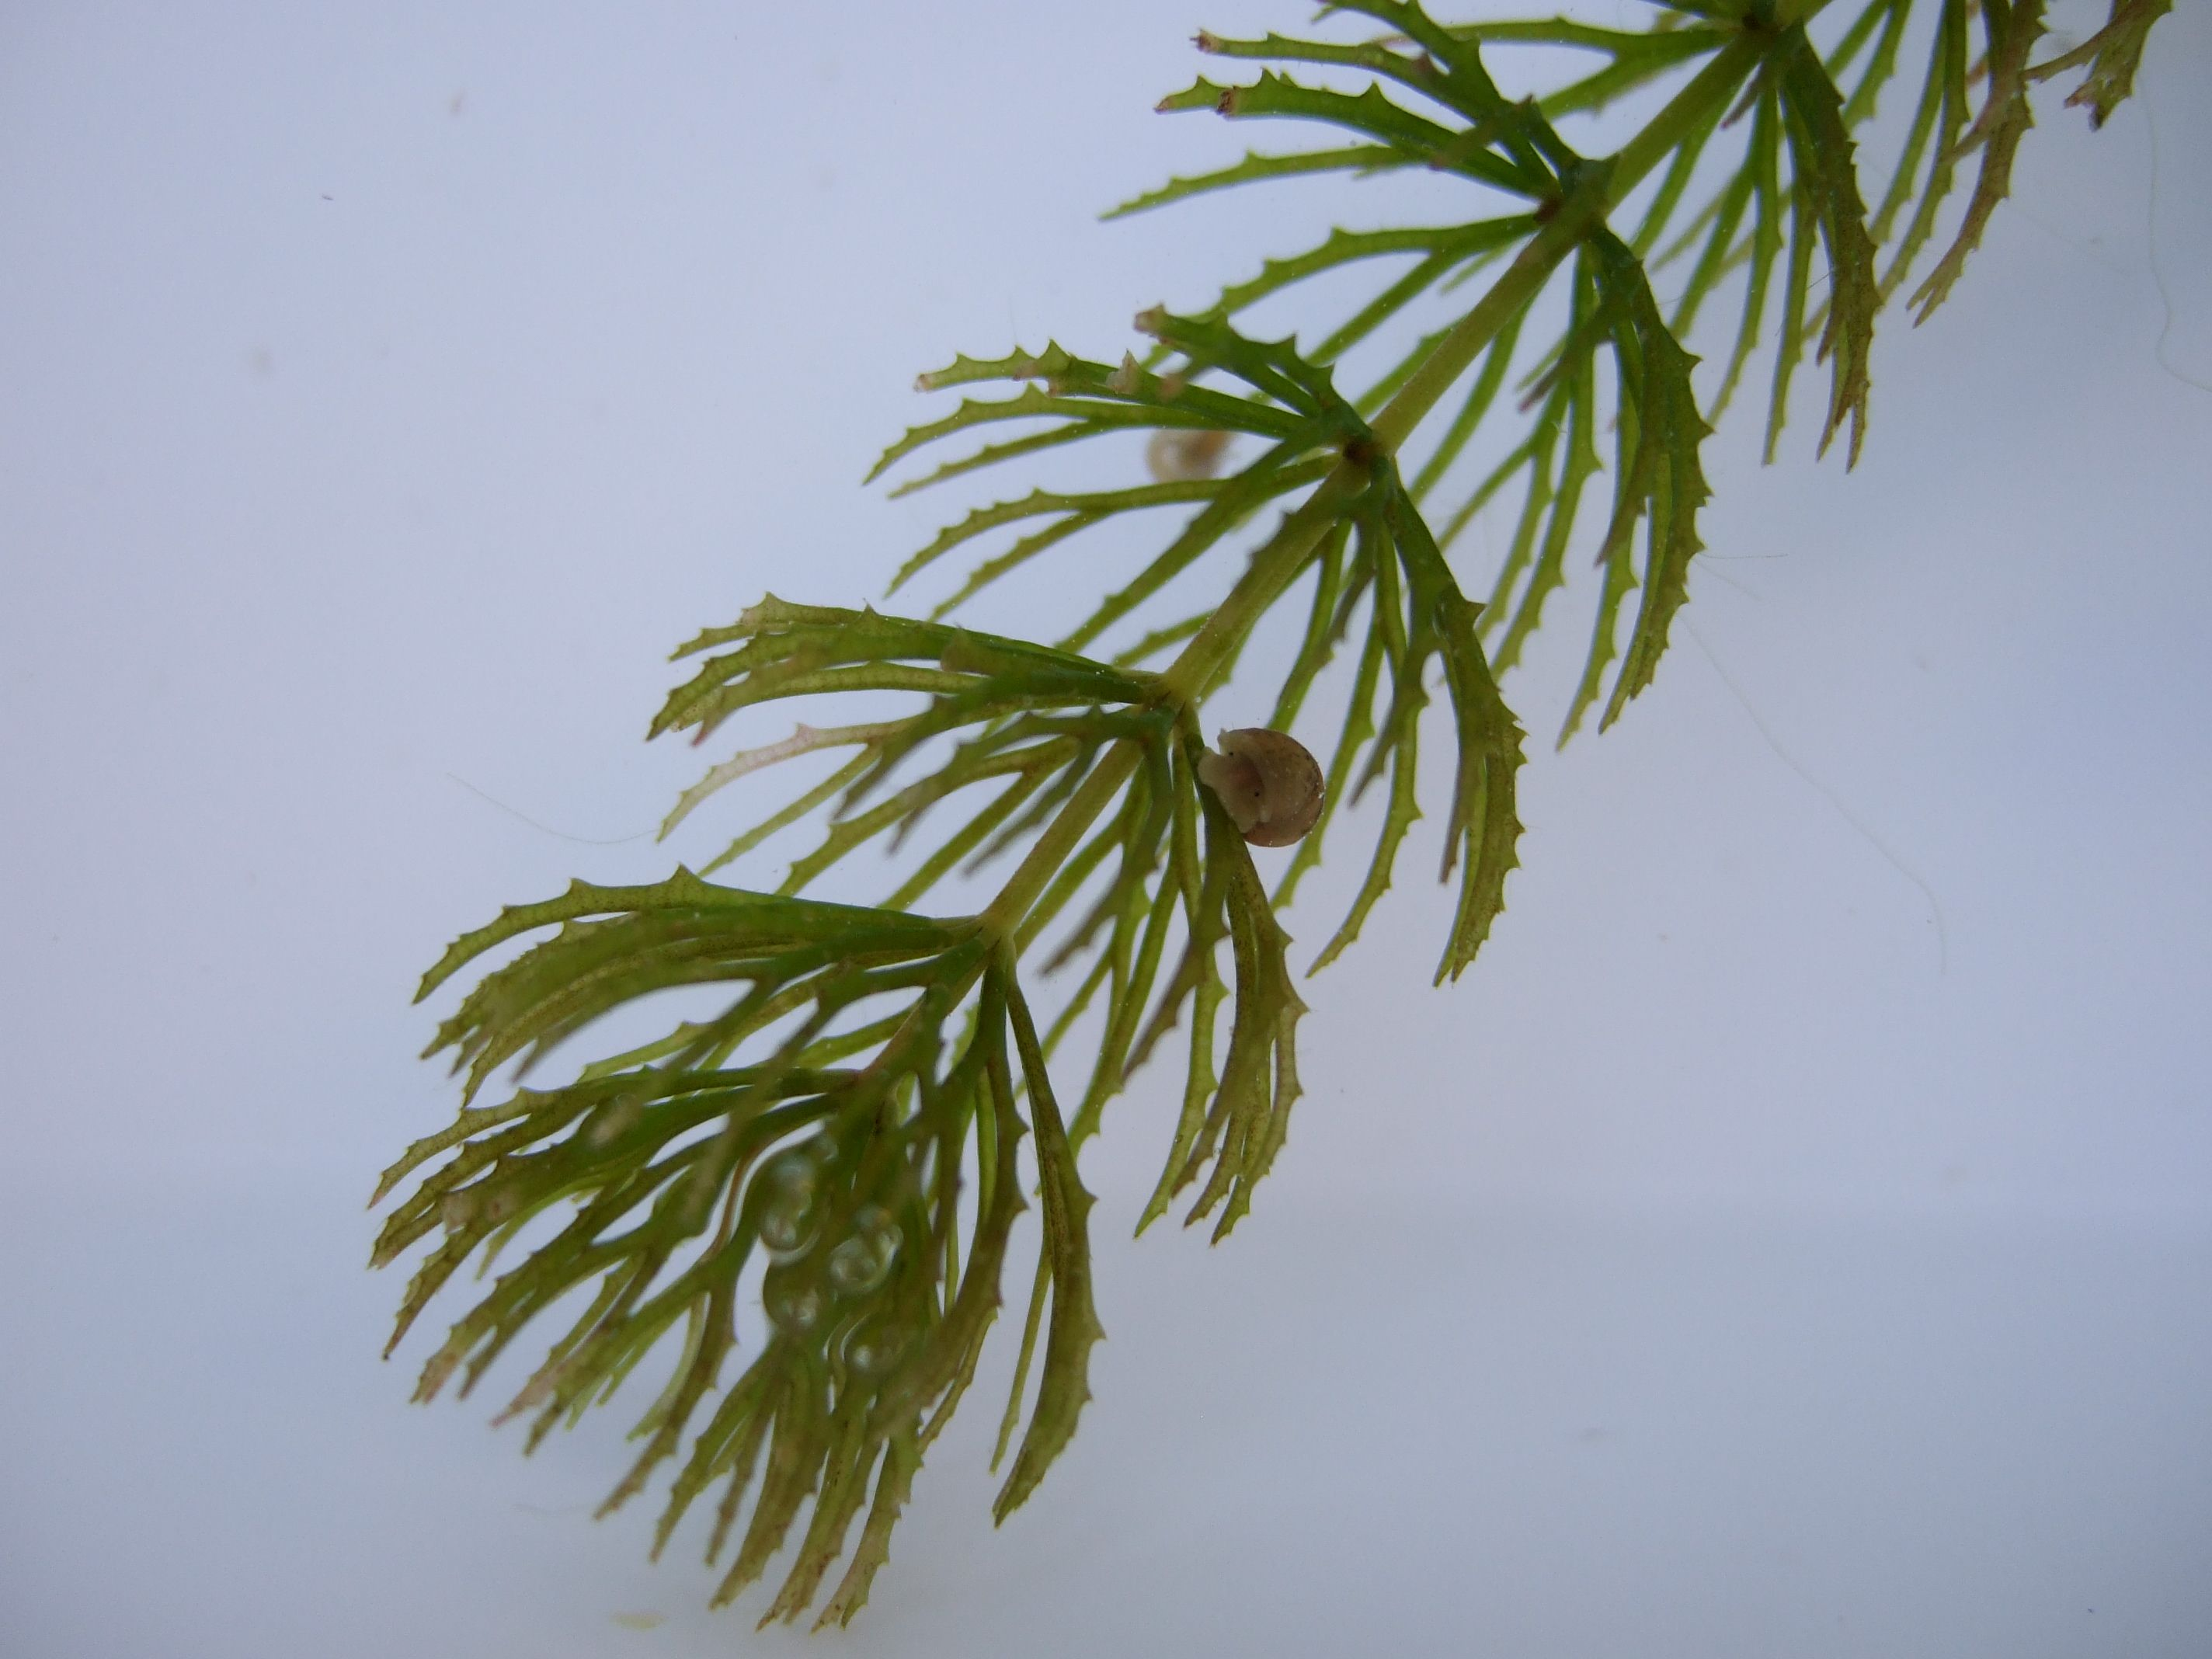 ceratophyllum2.jpg